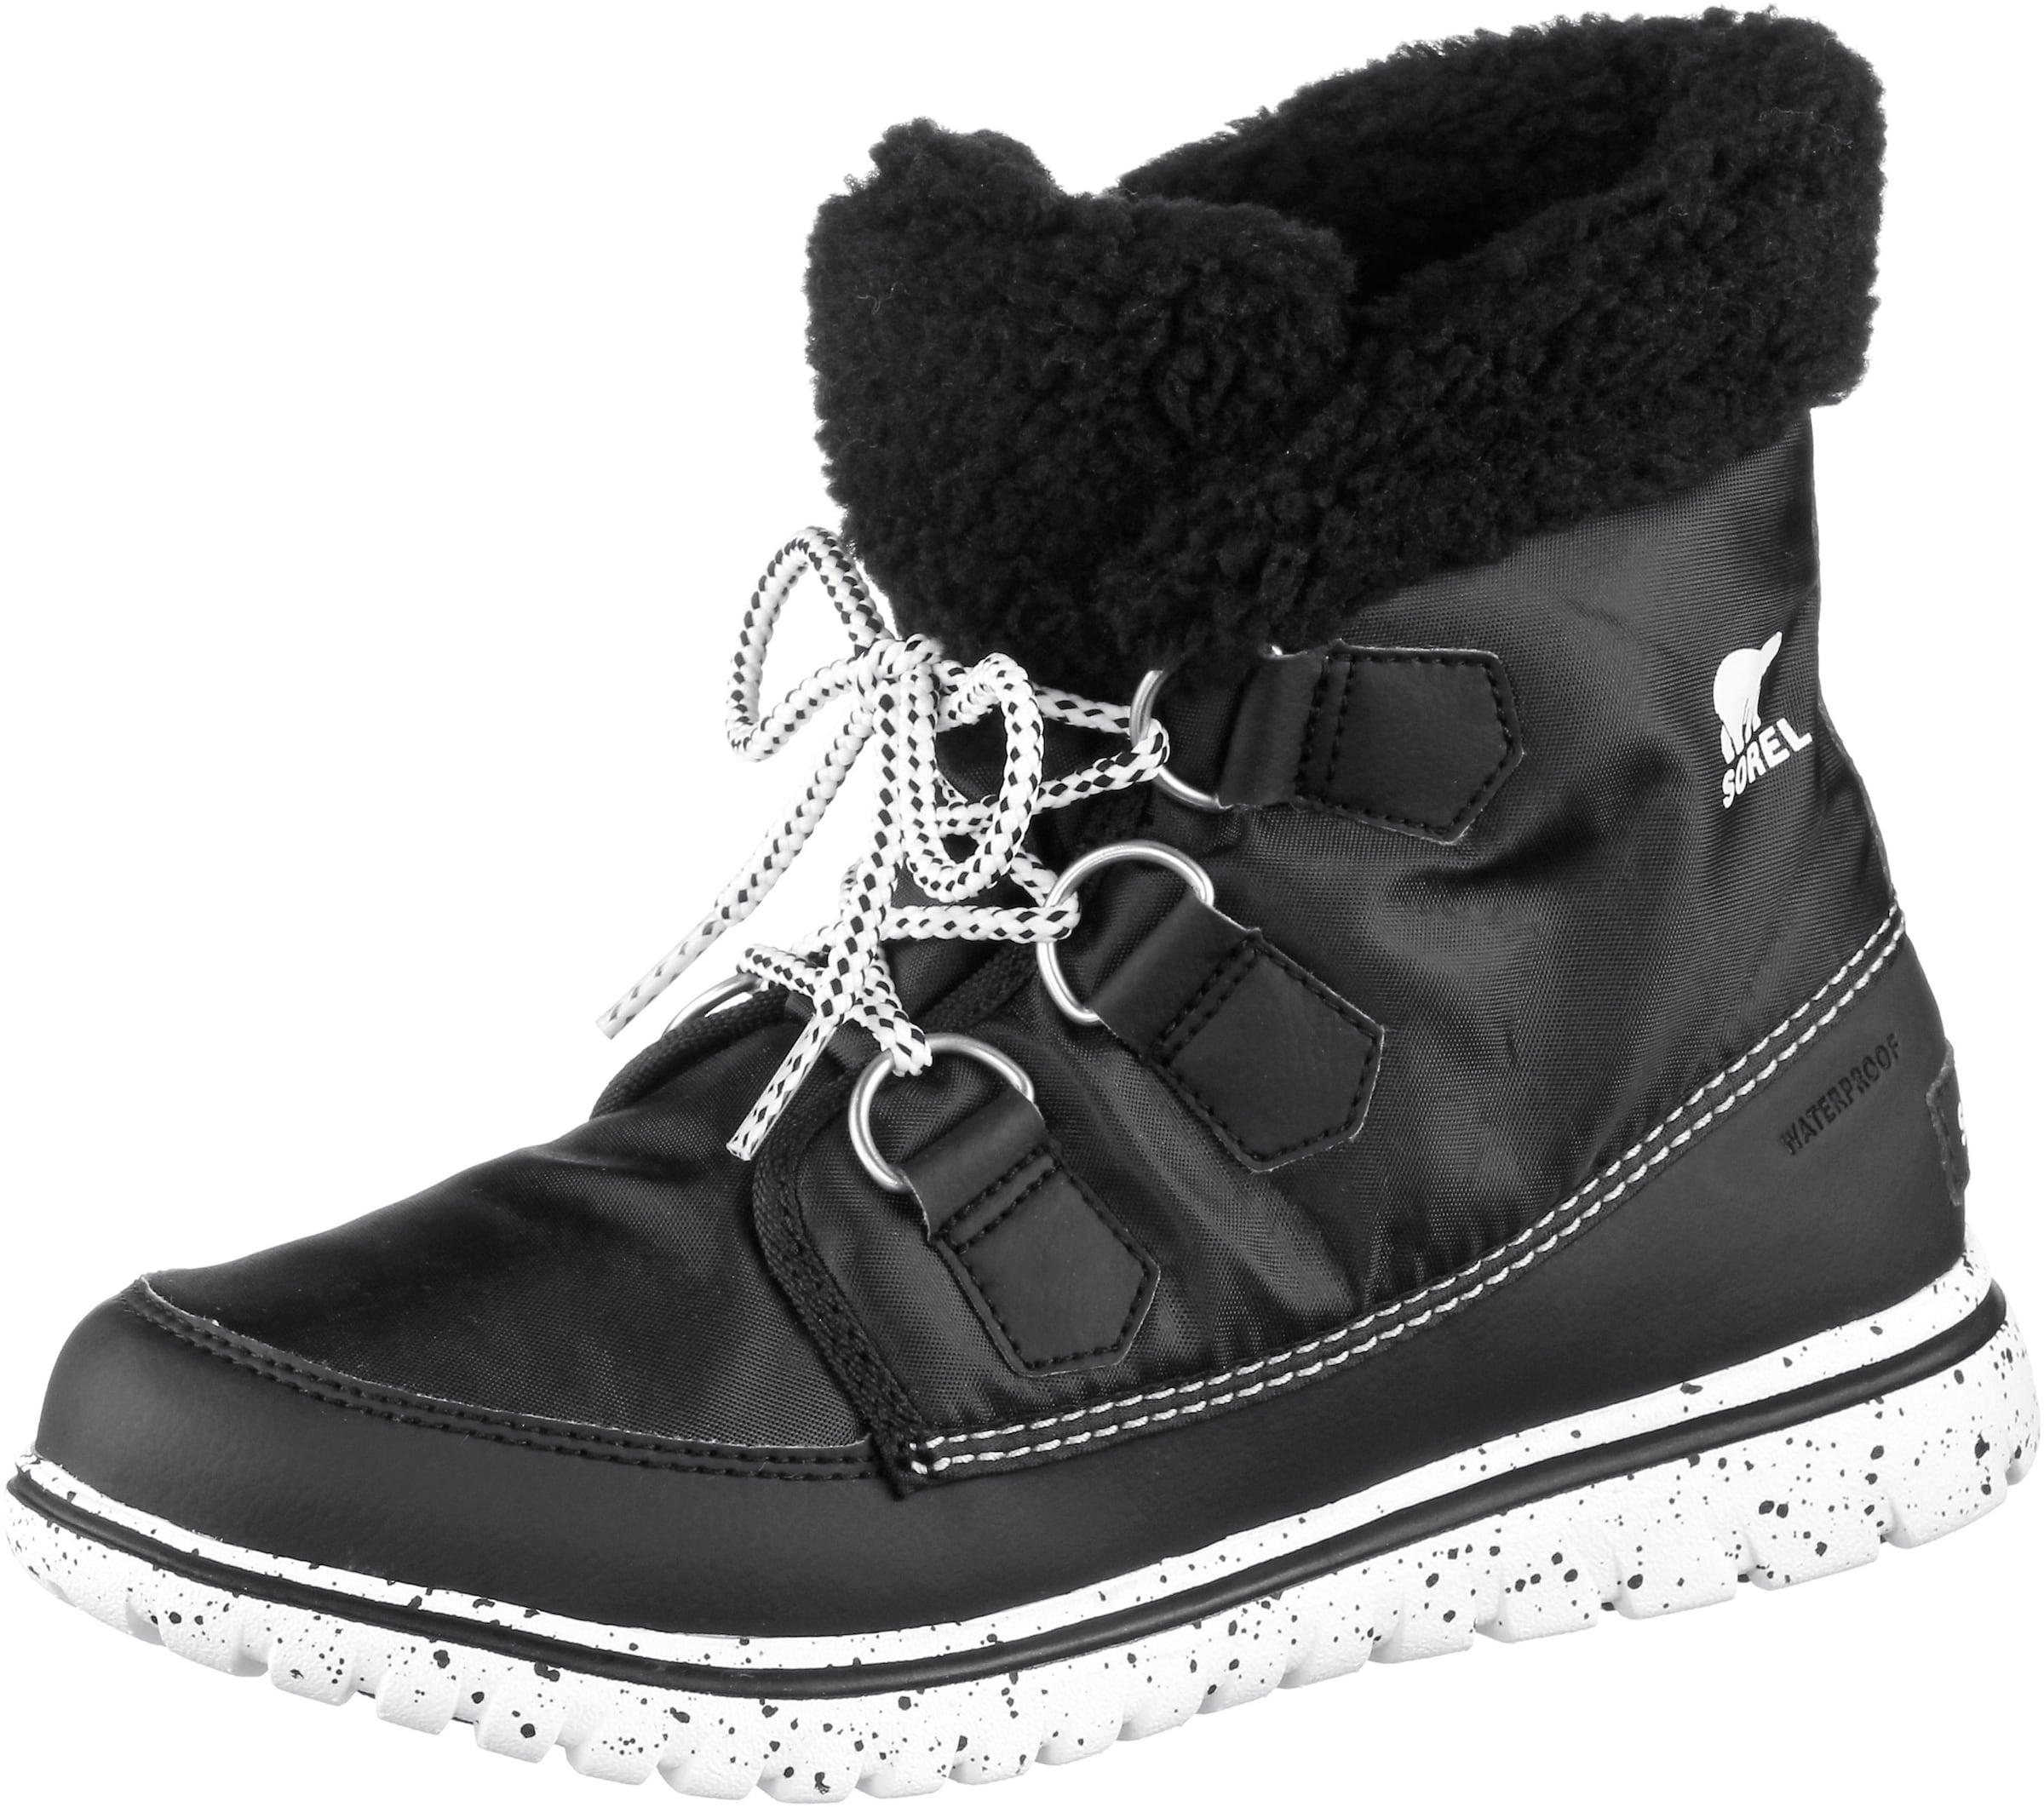 SOREL Cozy Carnival Winterschuh Verschleißfeste billige Schuhe